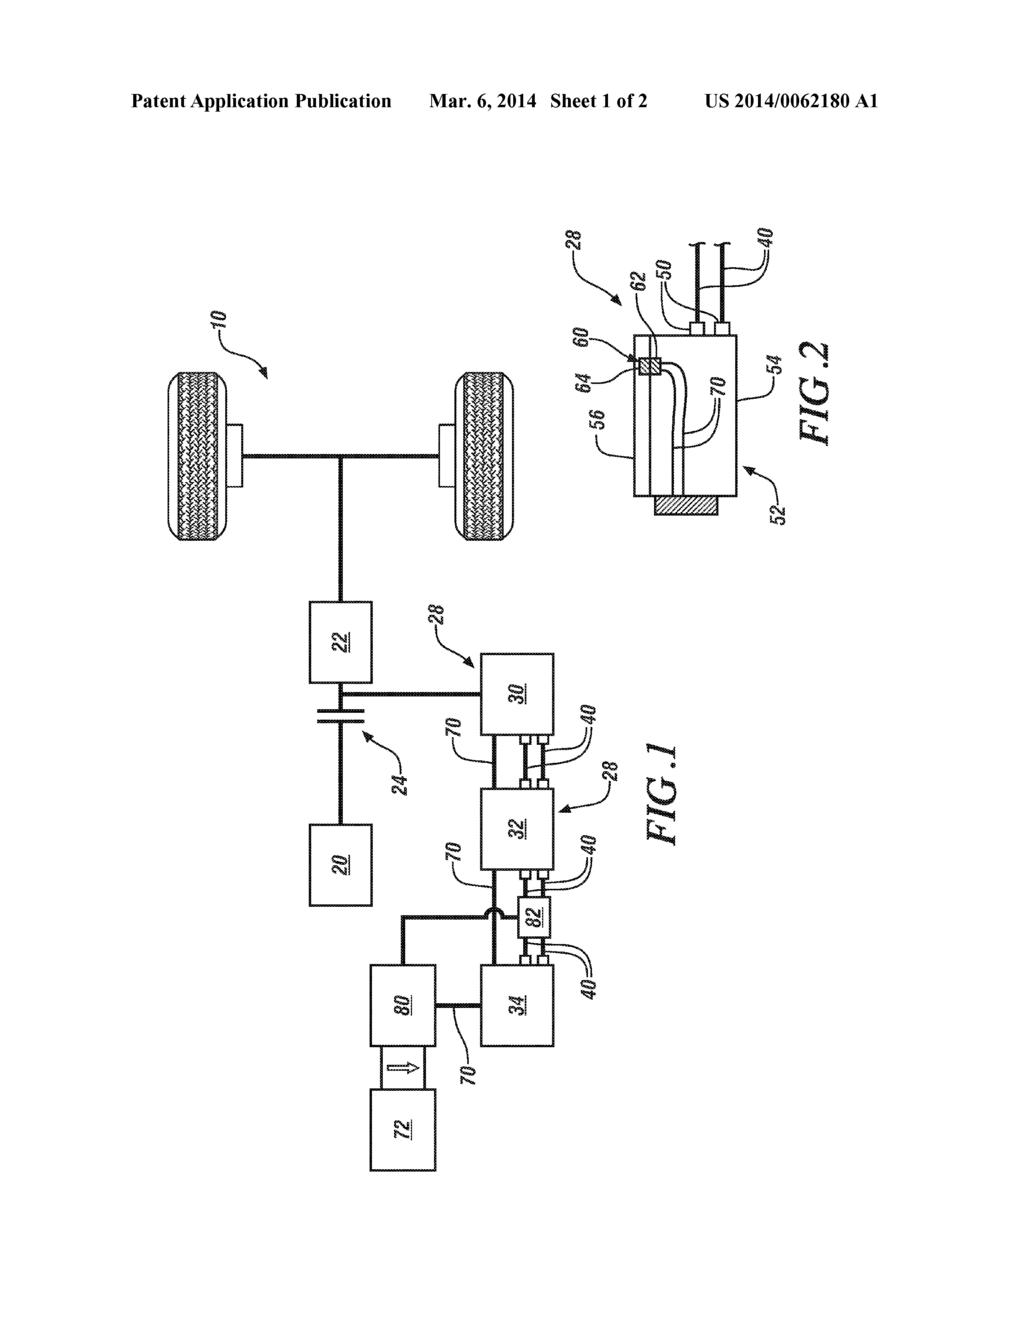 20140062180_02 high voltage interlock loop (\